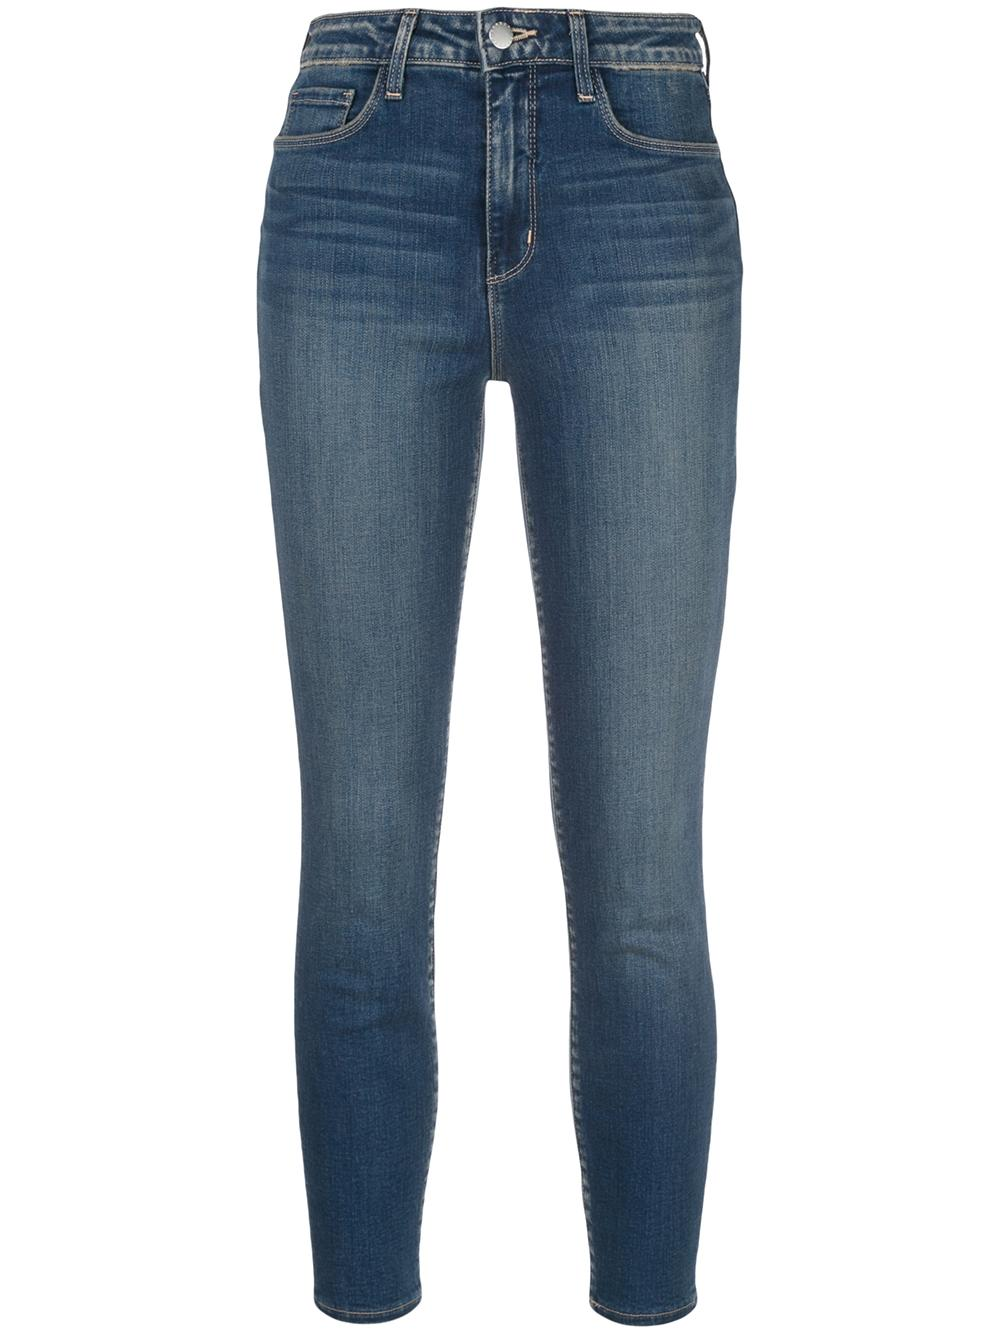 Margot High Rise Skinny Jean Item # 2294D18